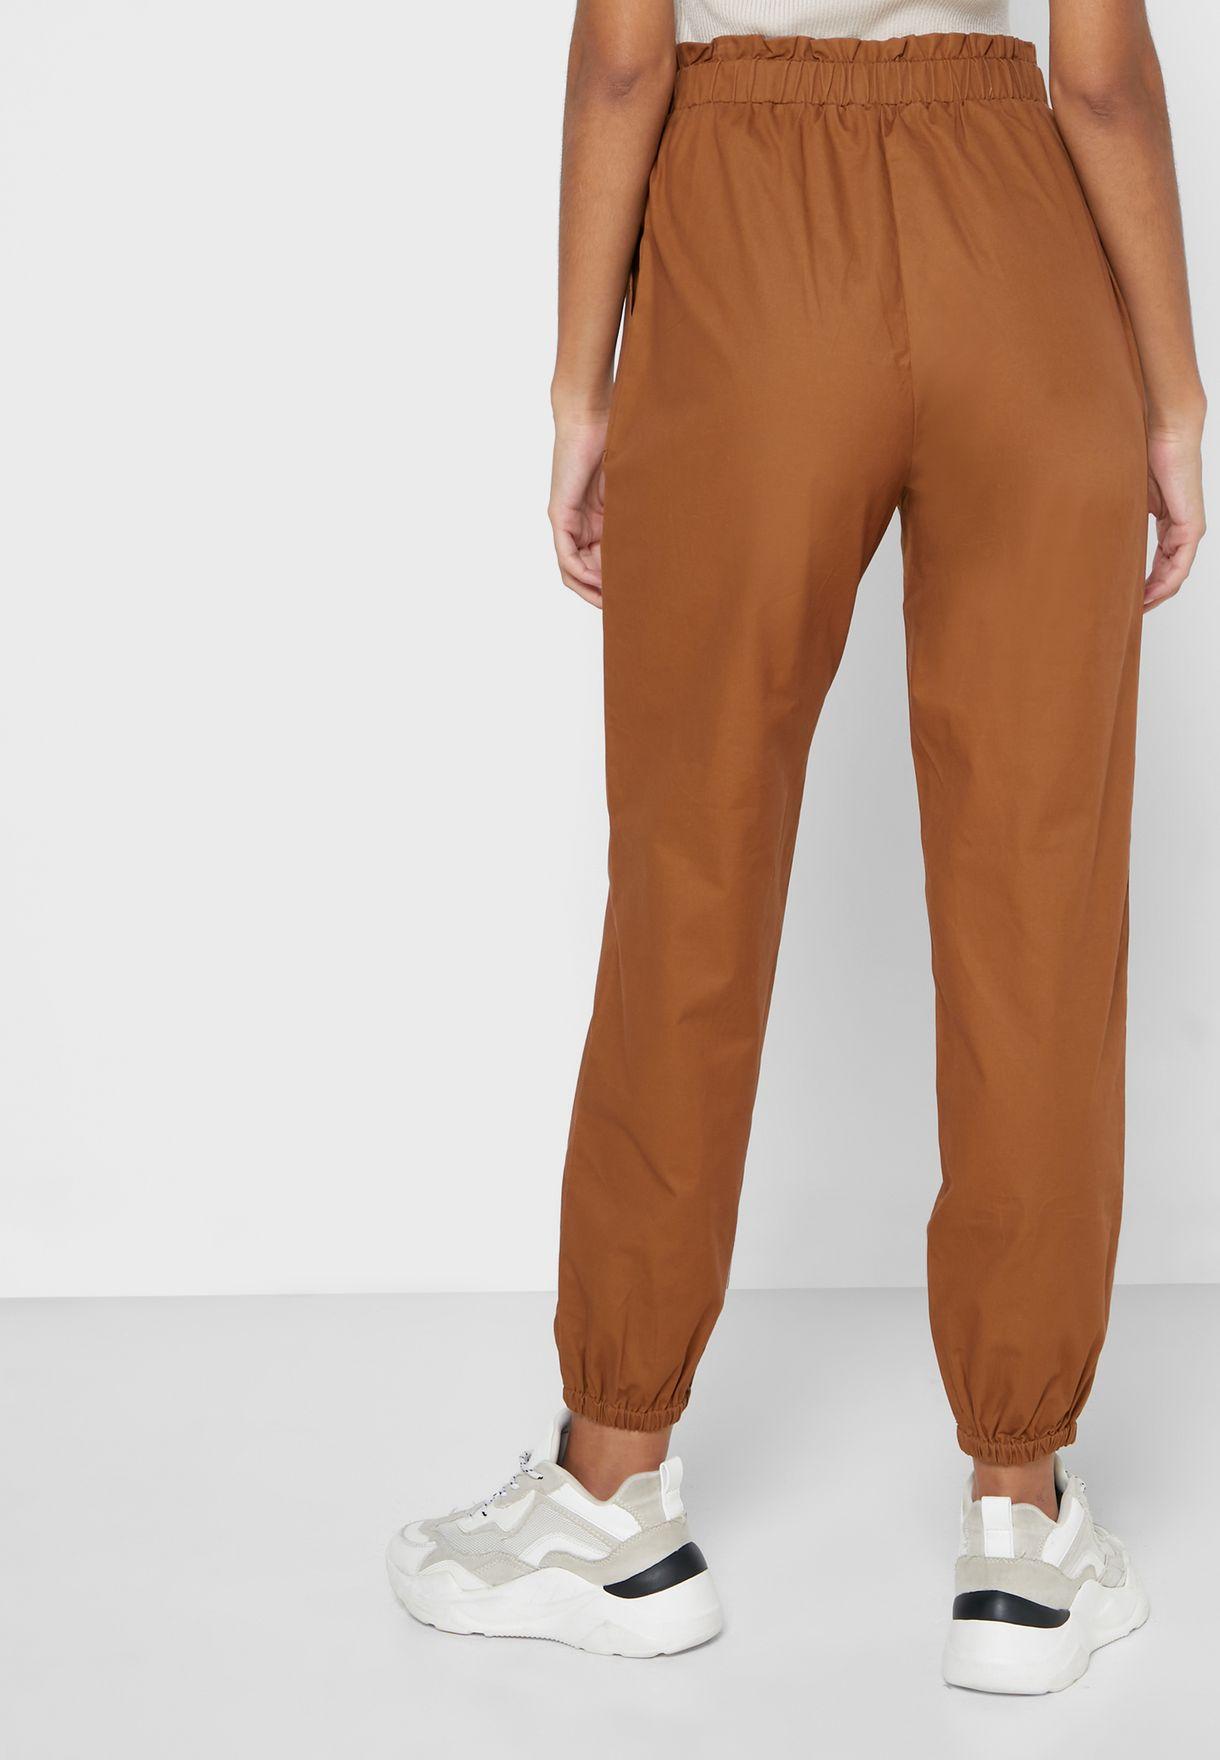 Cuffed Hem pants